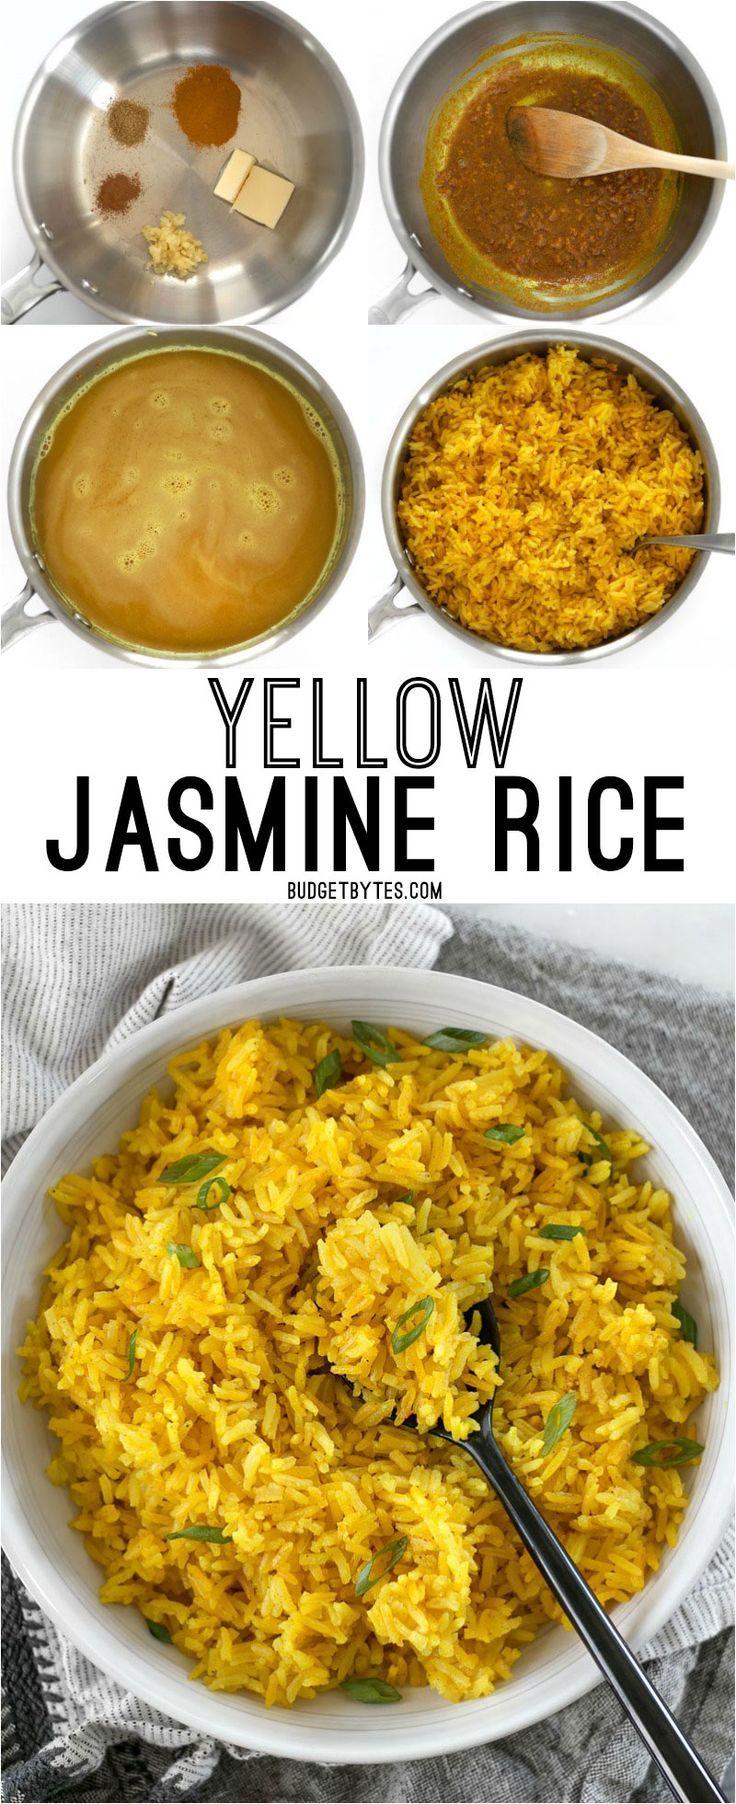 Yellow Jasmine Rice | Recipe | Food recipes, Food, Food dishes